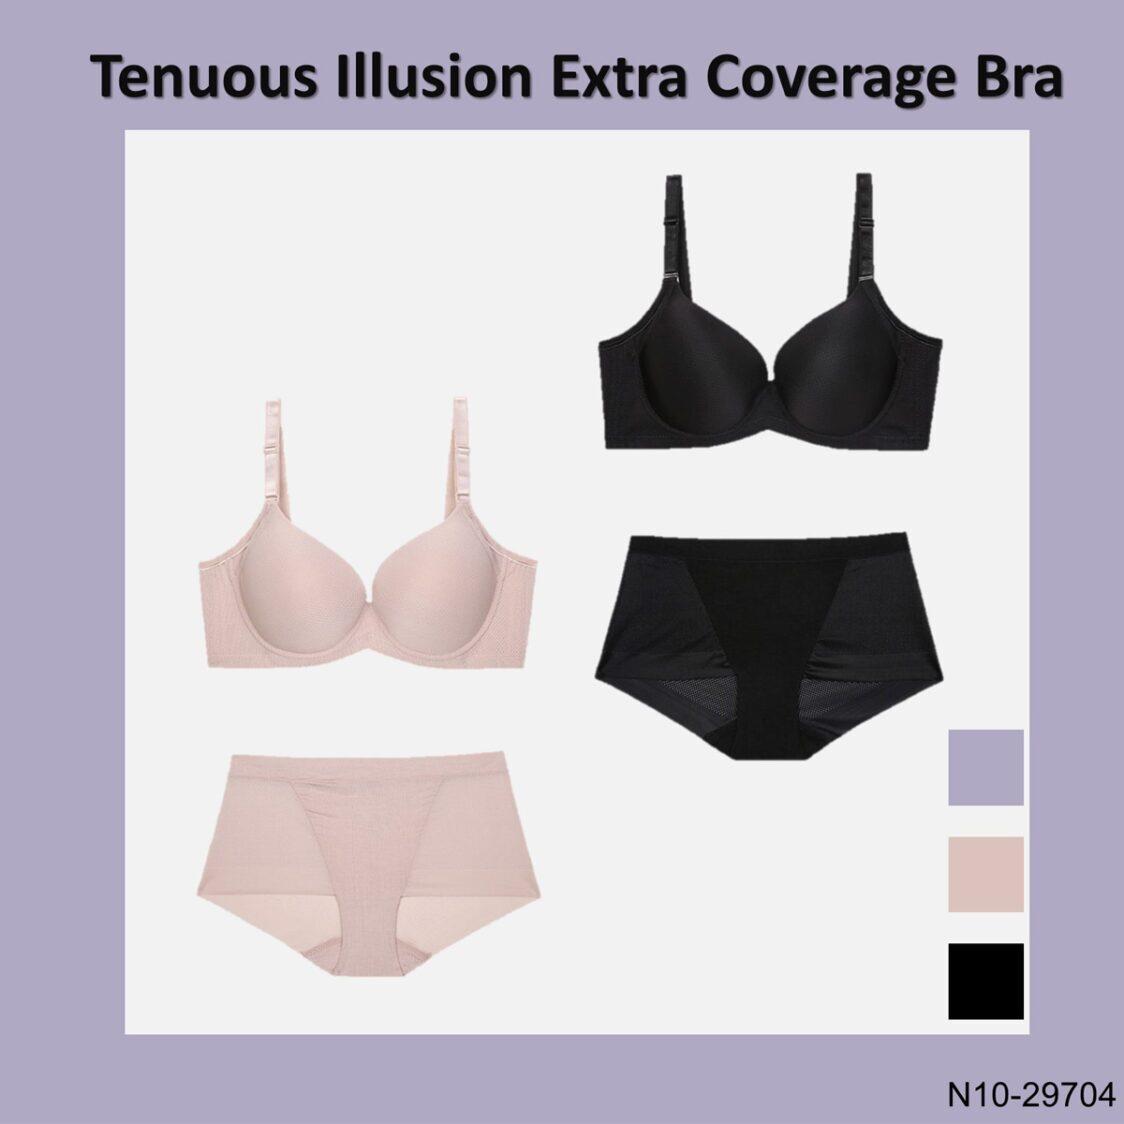 Tenuous Illusion Extra Coverage Bra N10-29704BLK Black